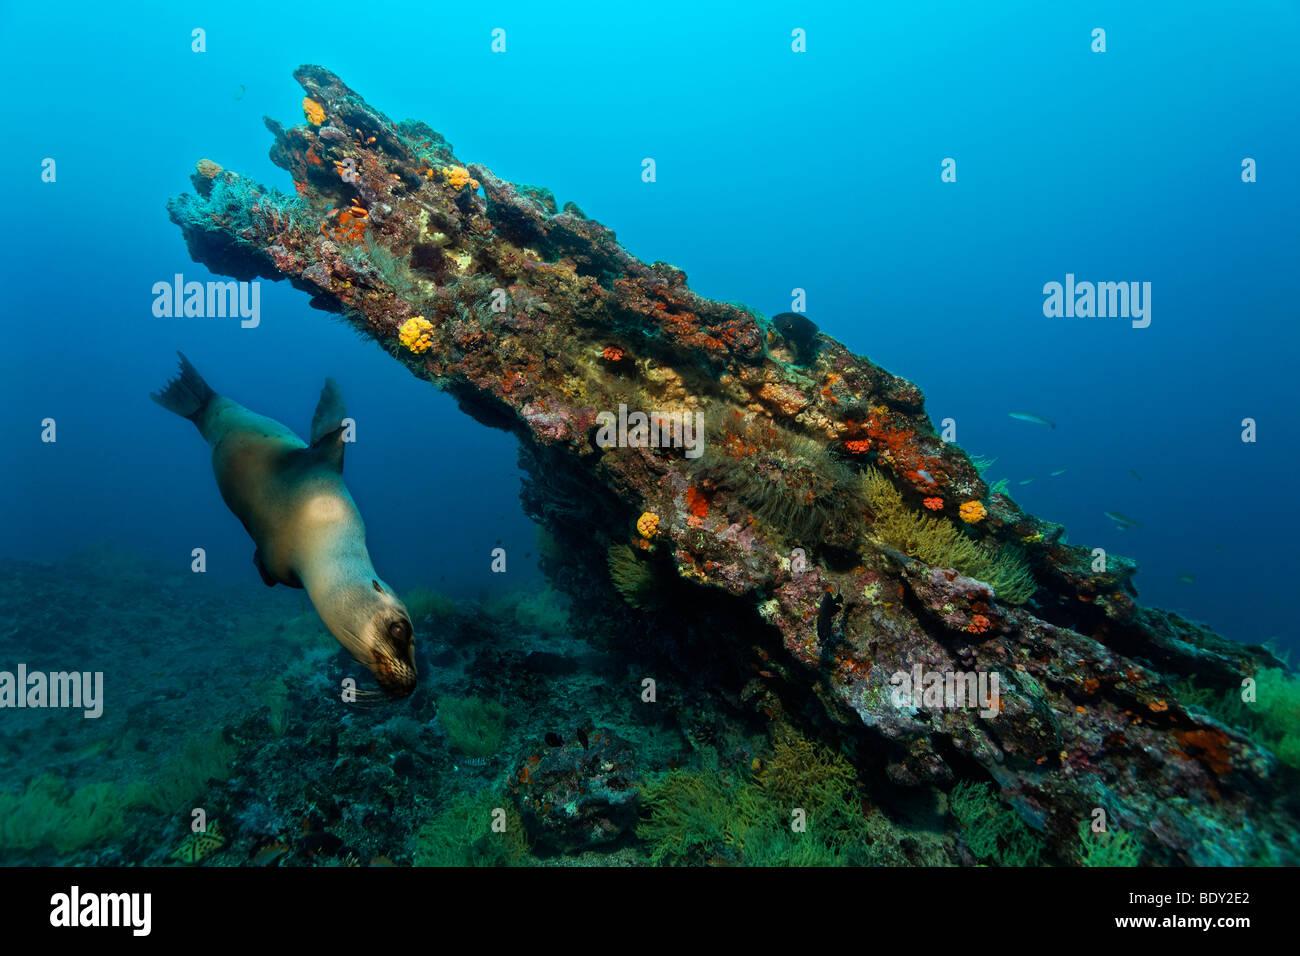 Diagonal rock reef with female Galapagos Fur Seal (Arctocephalus galapagoensis), Cousin Rock, UNESCO World Heritage - Stock Image